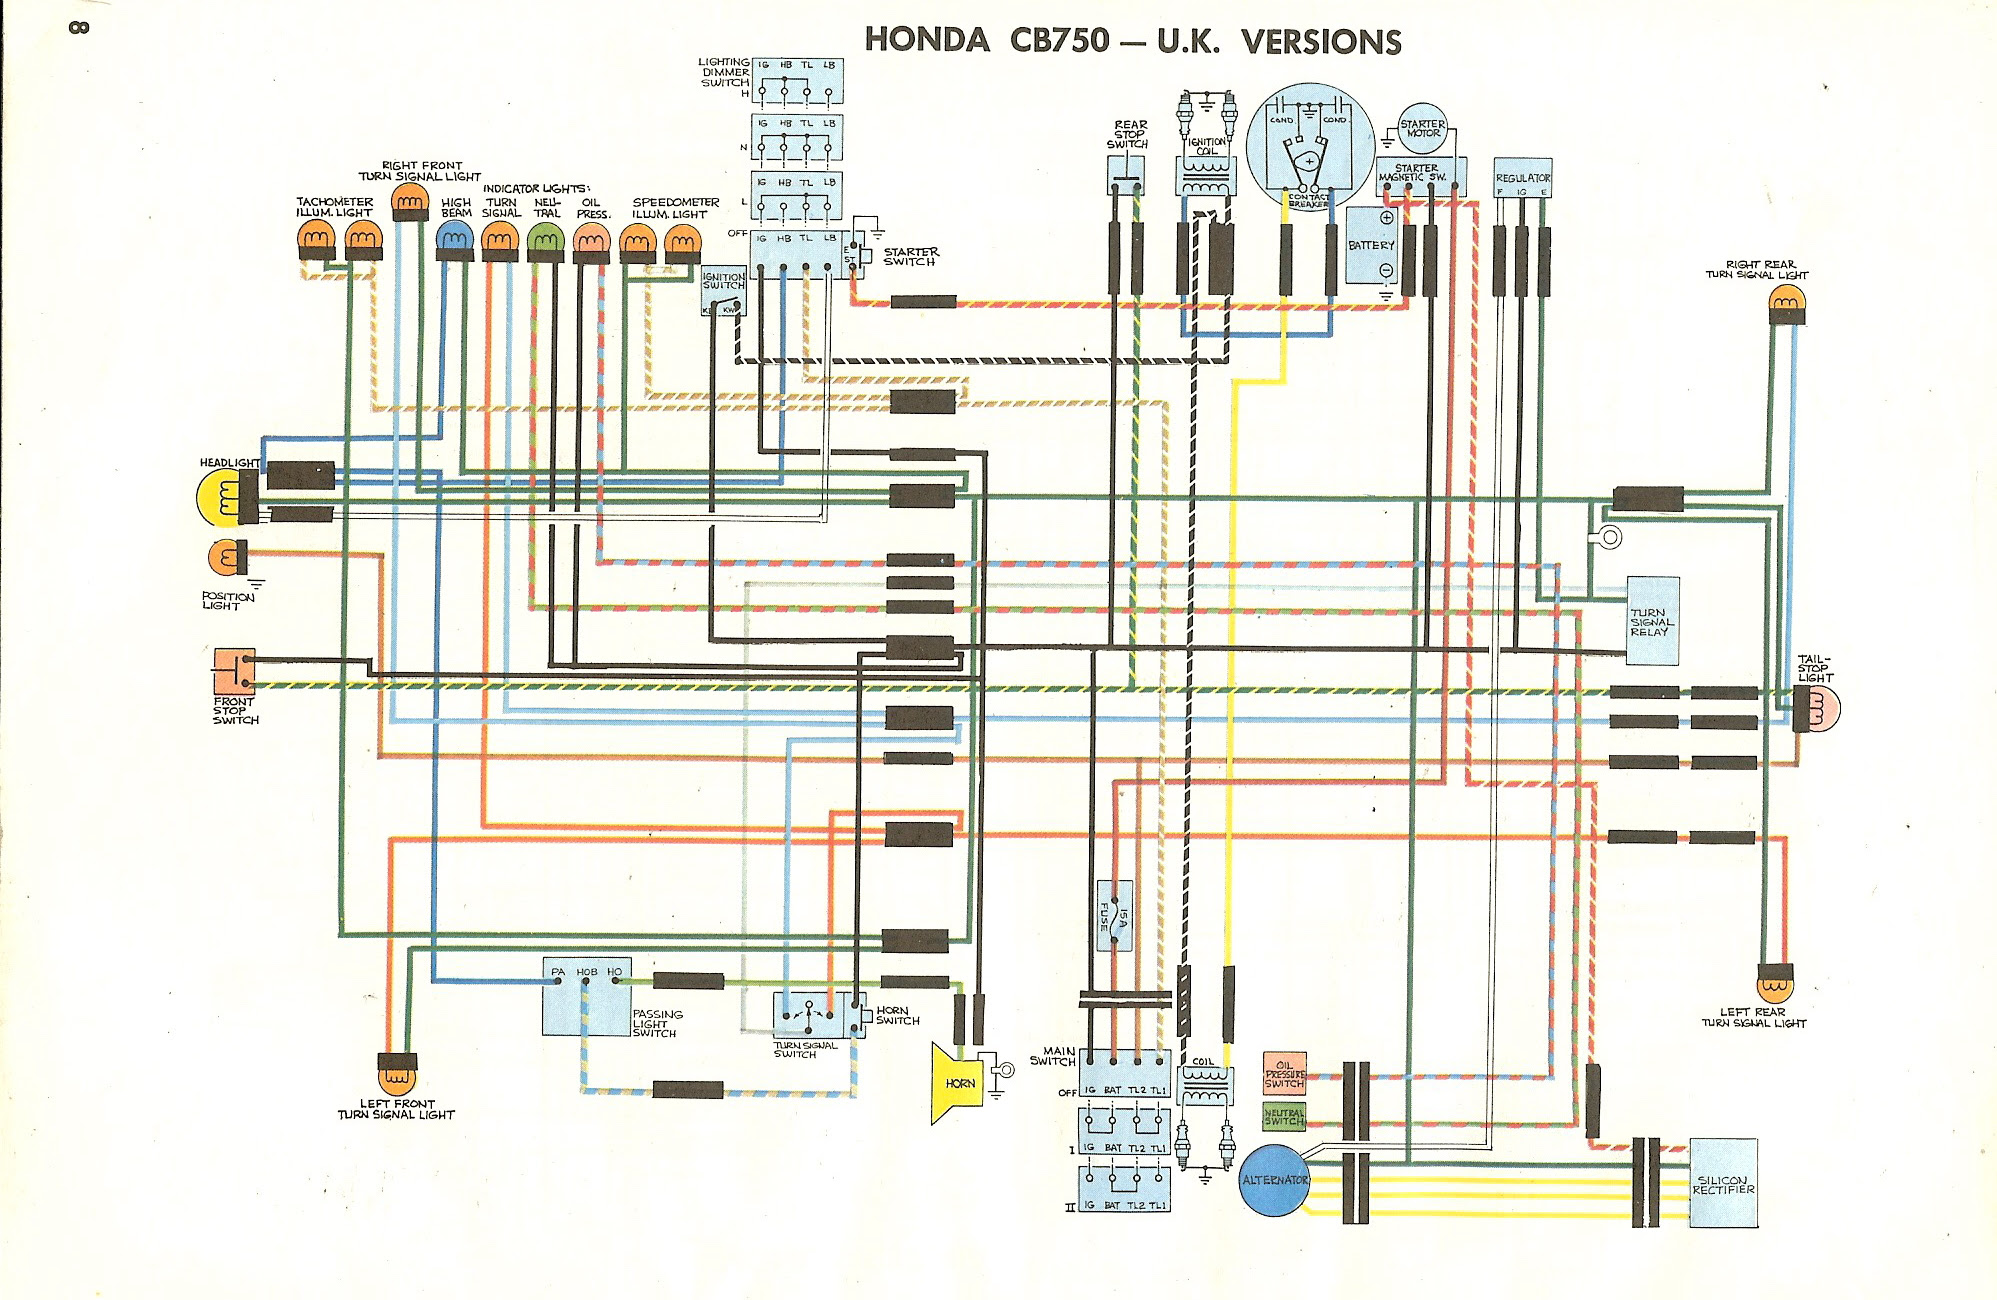 1981 Cb 750 C Honda Wiring Diagram